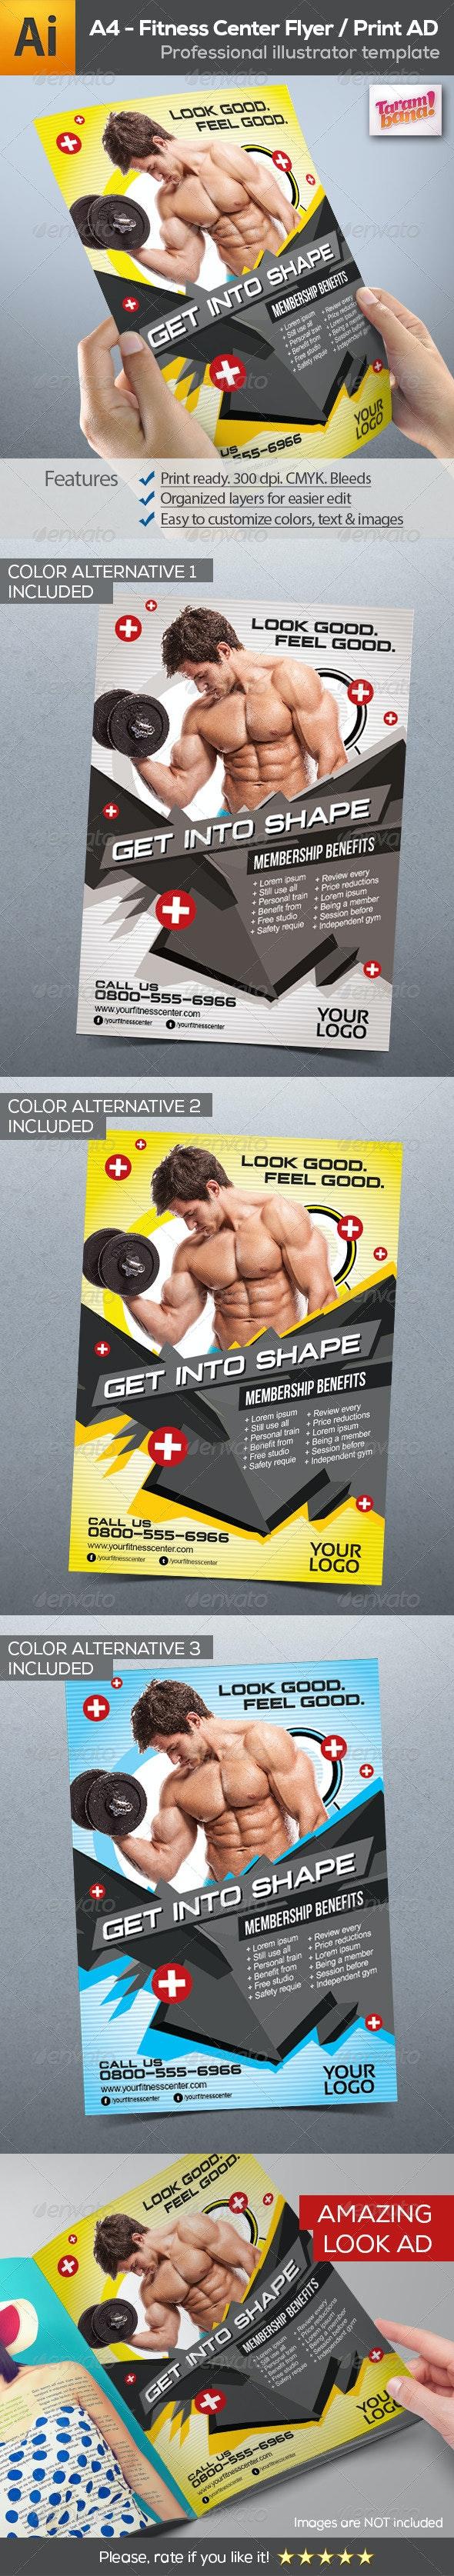 Fitness Center Flyer Print AD - Flyers Print Templates